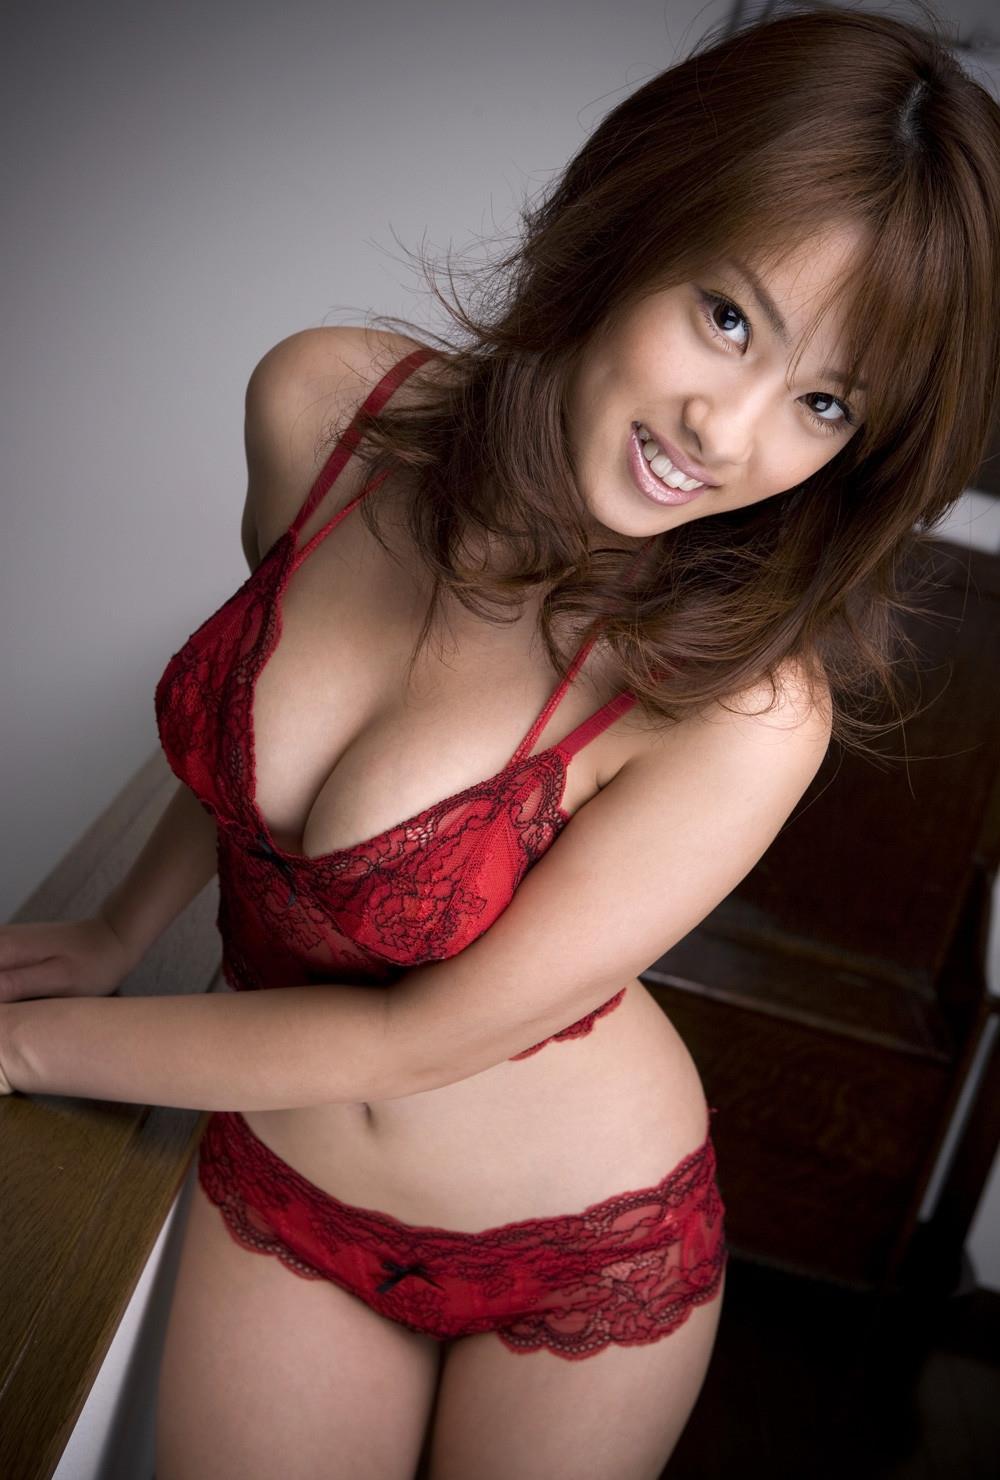 野田彩加 エロ画像 38